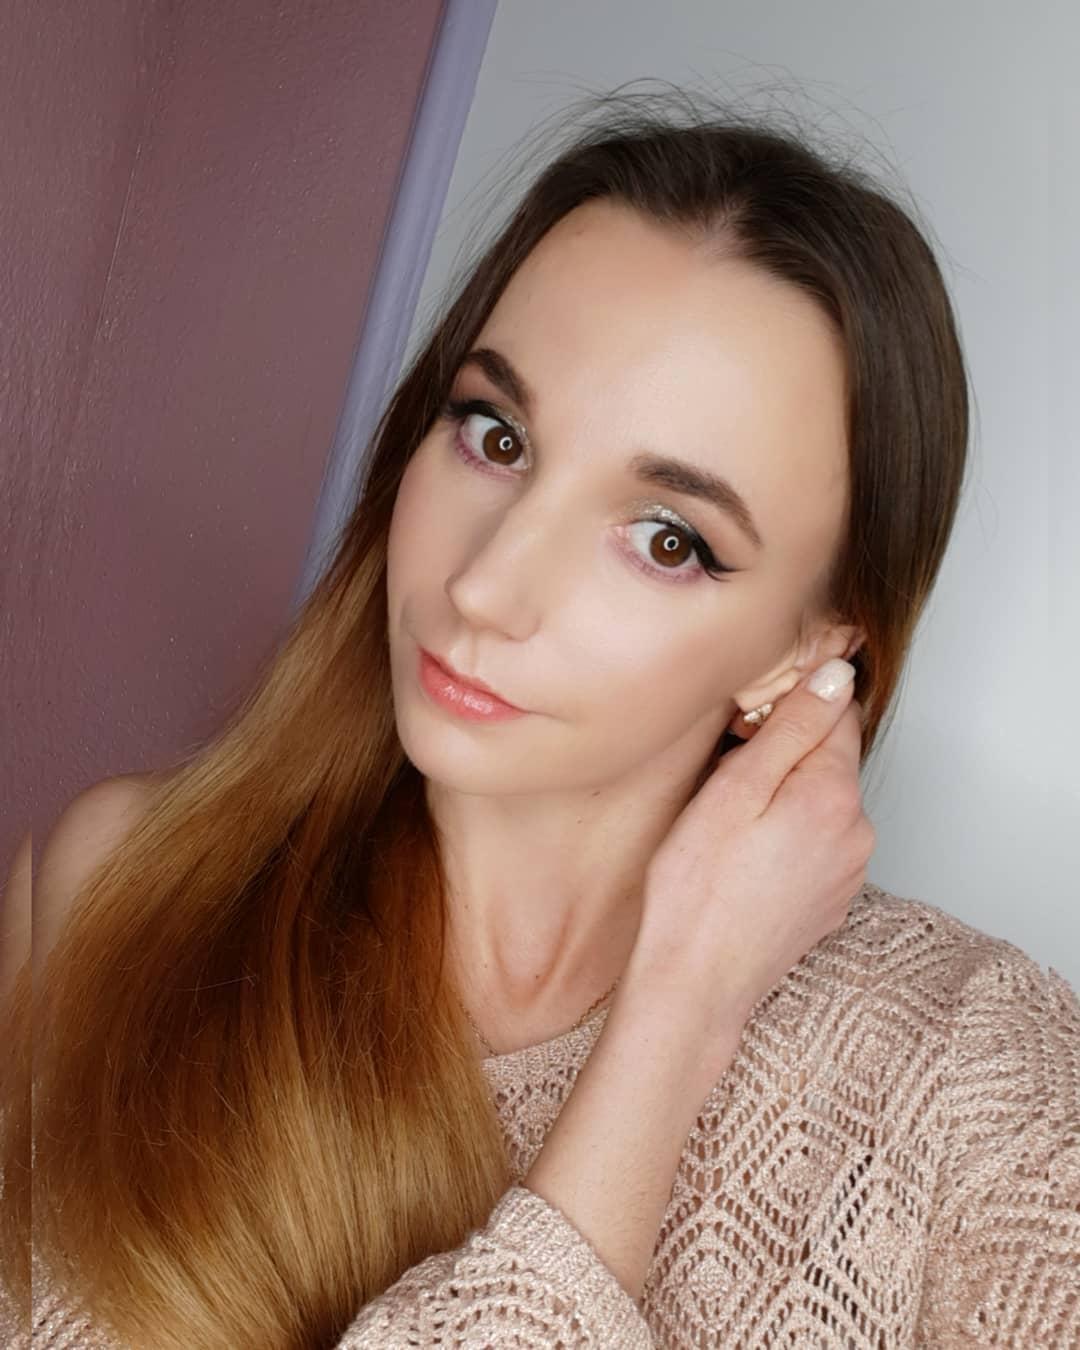 Alinka-Vladimirova-Wallpapers-Insta-Fit-Bio-14